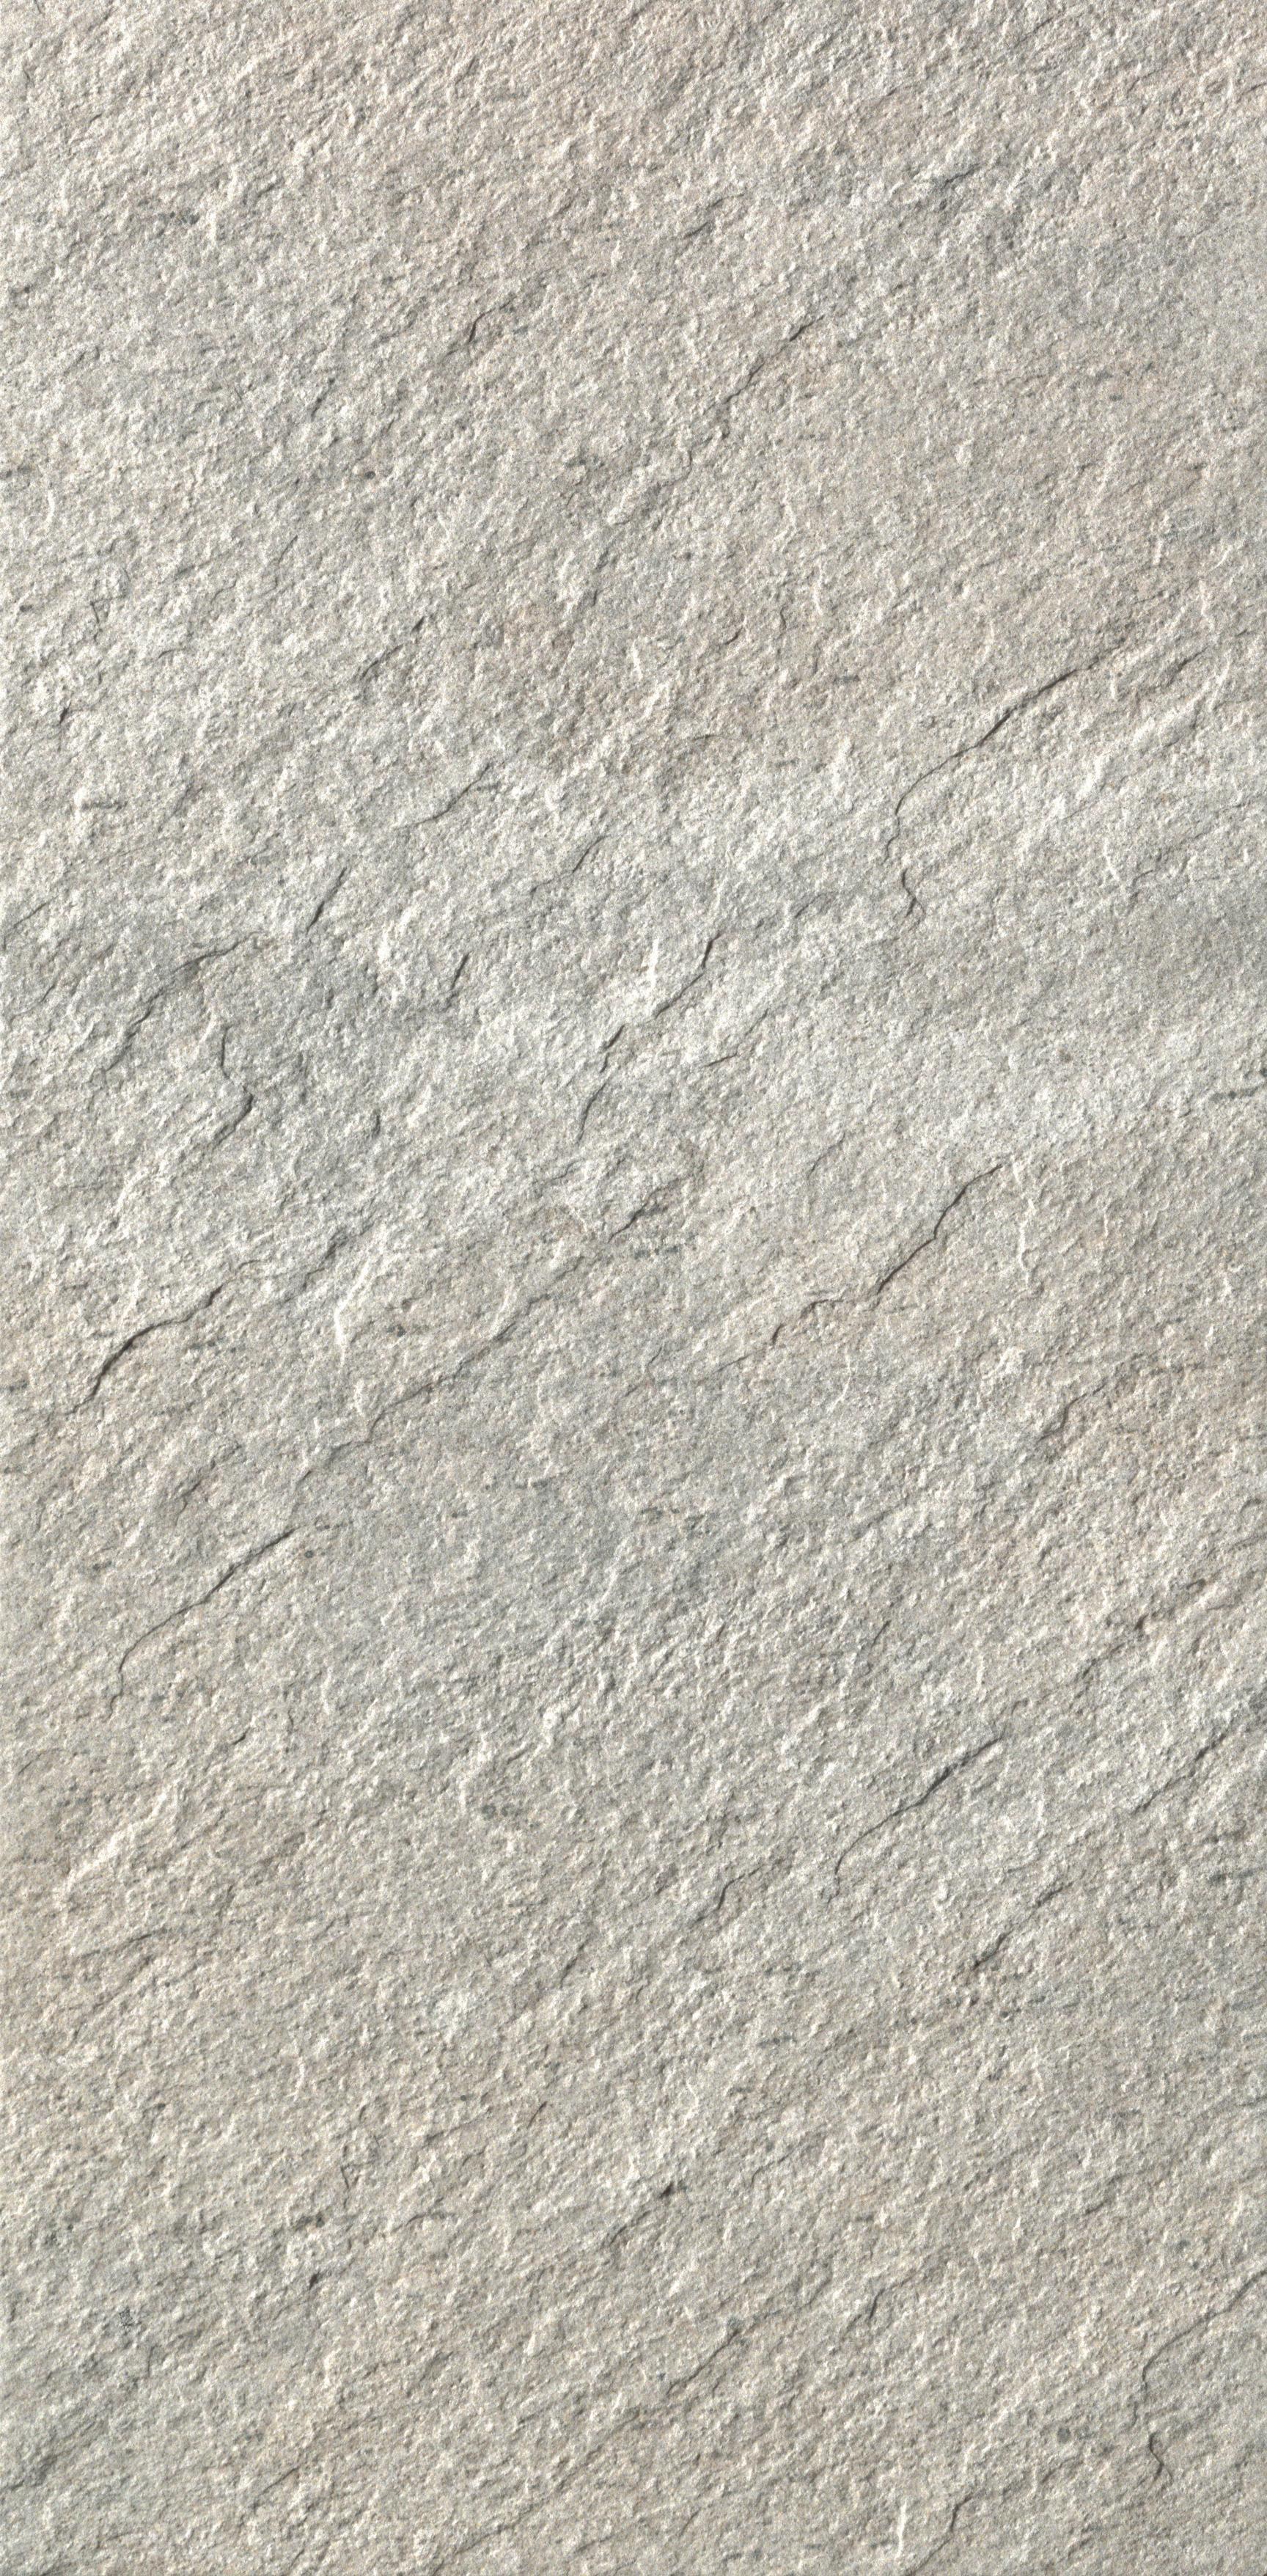 Ssiena Quartz Grey Tile Finish